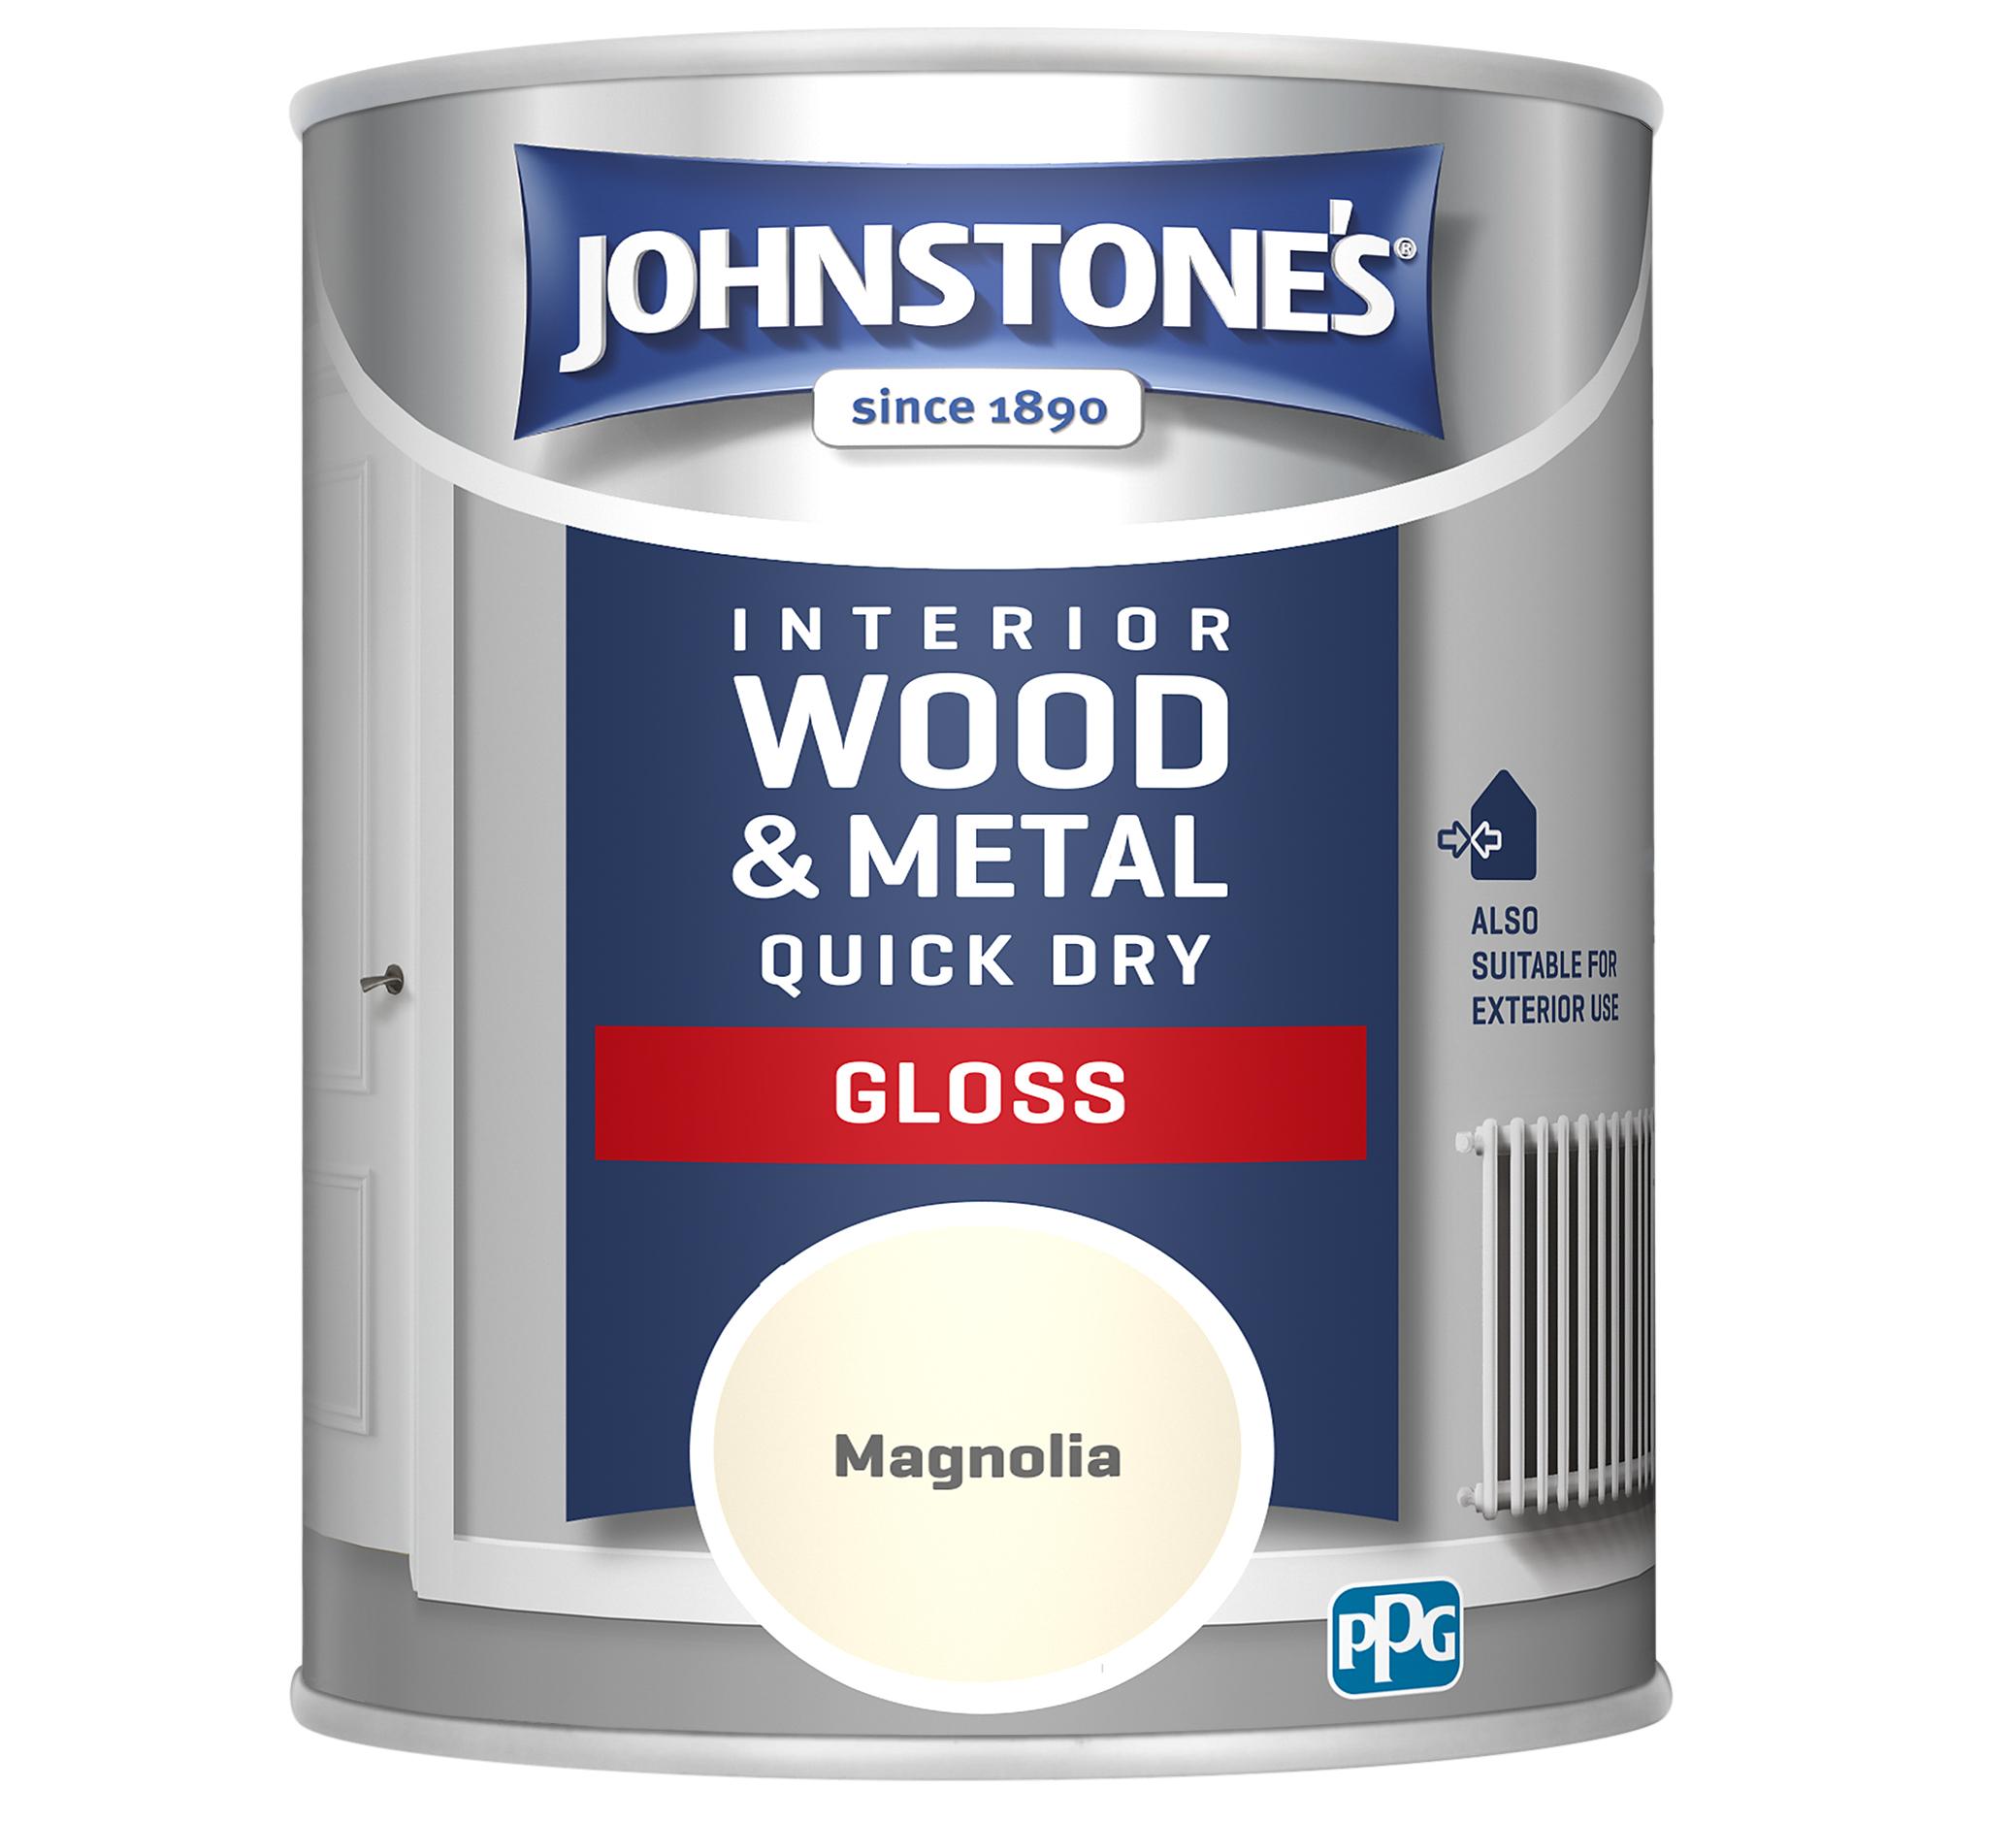 Johnstones 750ml Quick Dry Gloss Paint - Magnolia